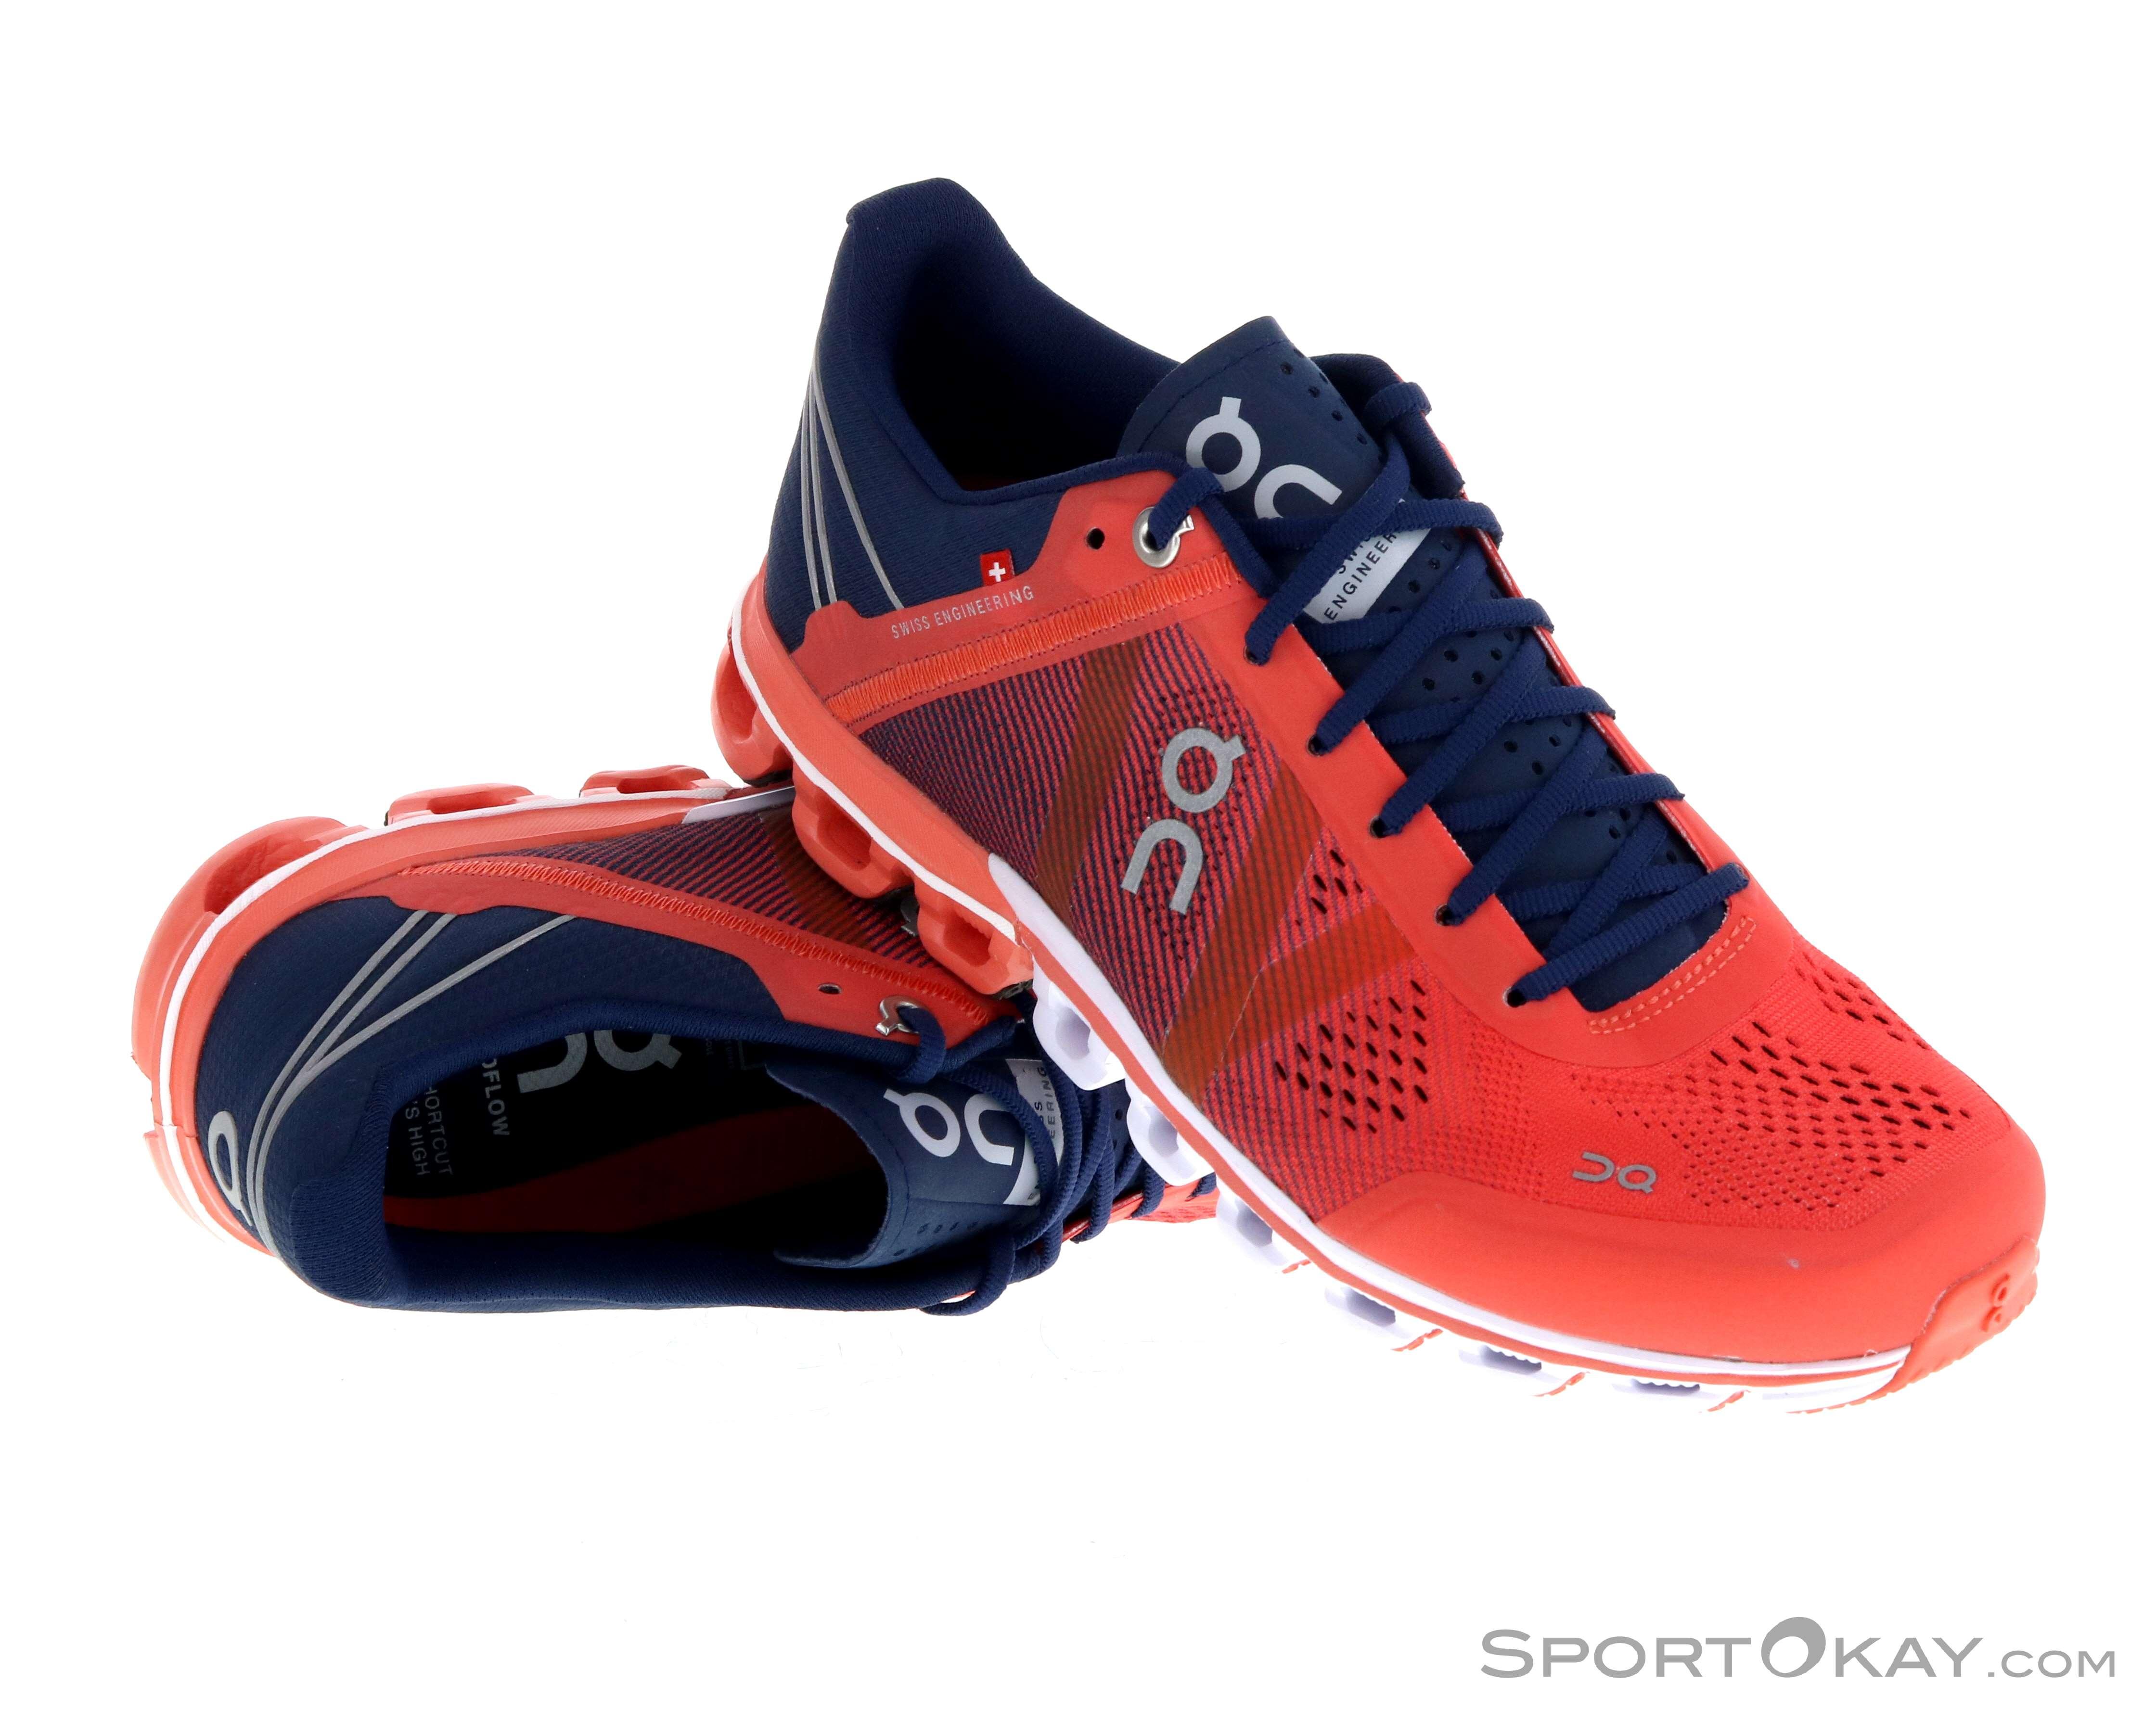 Schuhe: On Herren Laufschuhe Cloudflow blau Gr 43